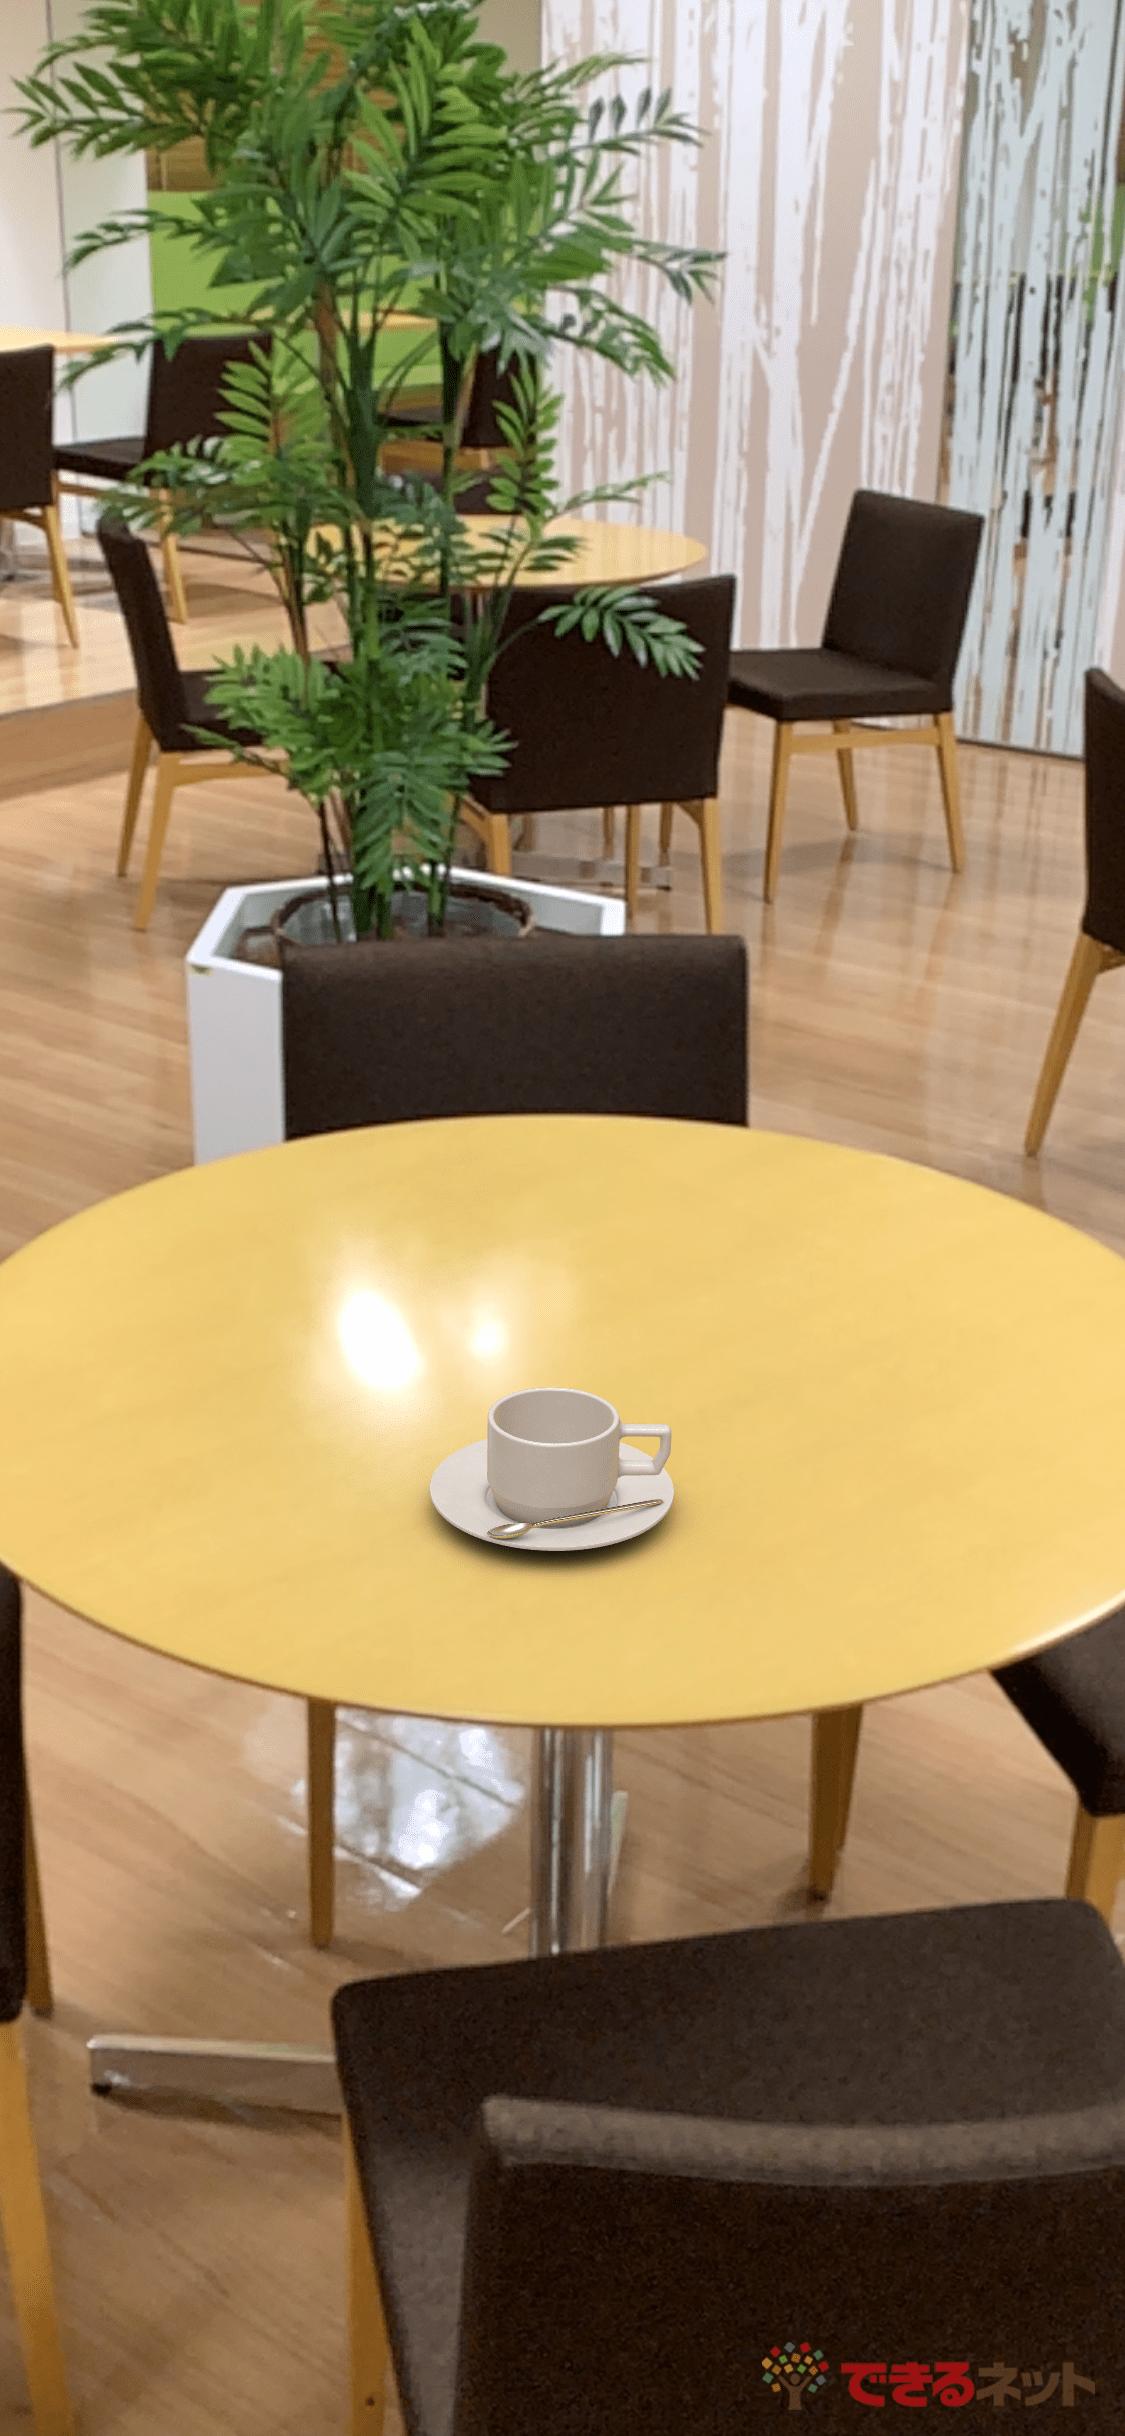 iPhoneでAR(拡張現実)を手軽に体験! 「ARKit」と「IKEA Place」で自宅に何でも配置できる